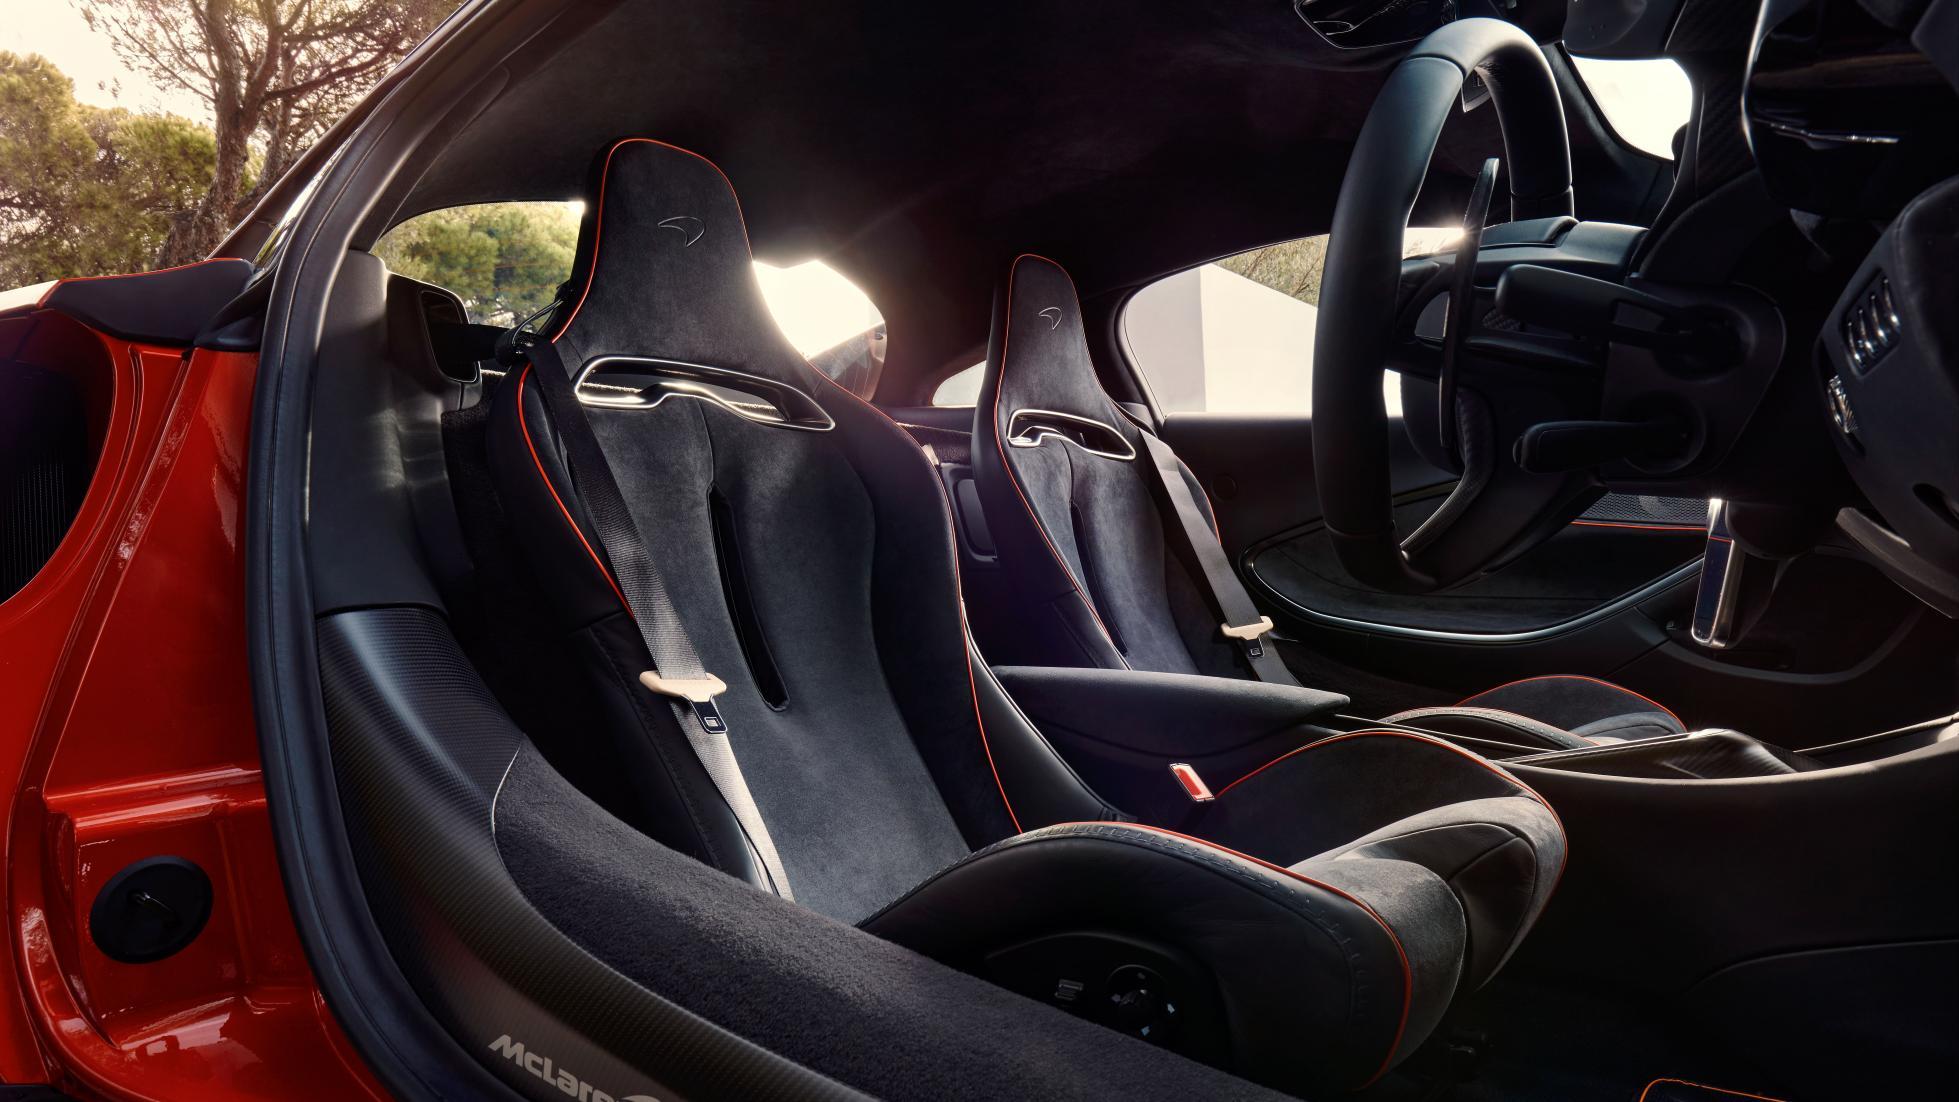 McLaren Artura passenger seats, driver POV